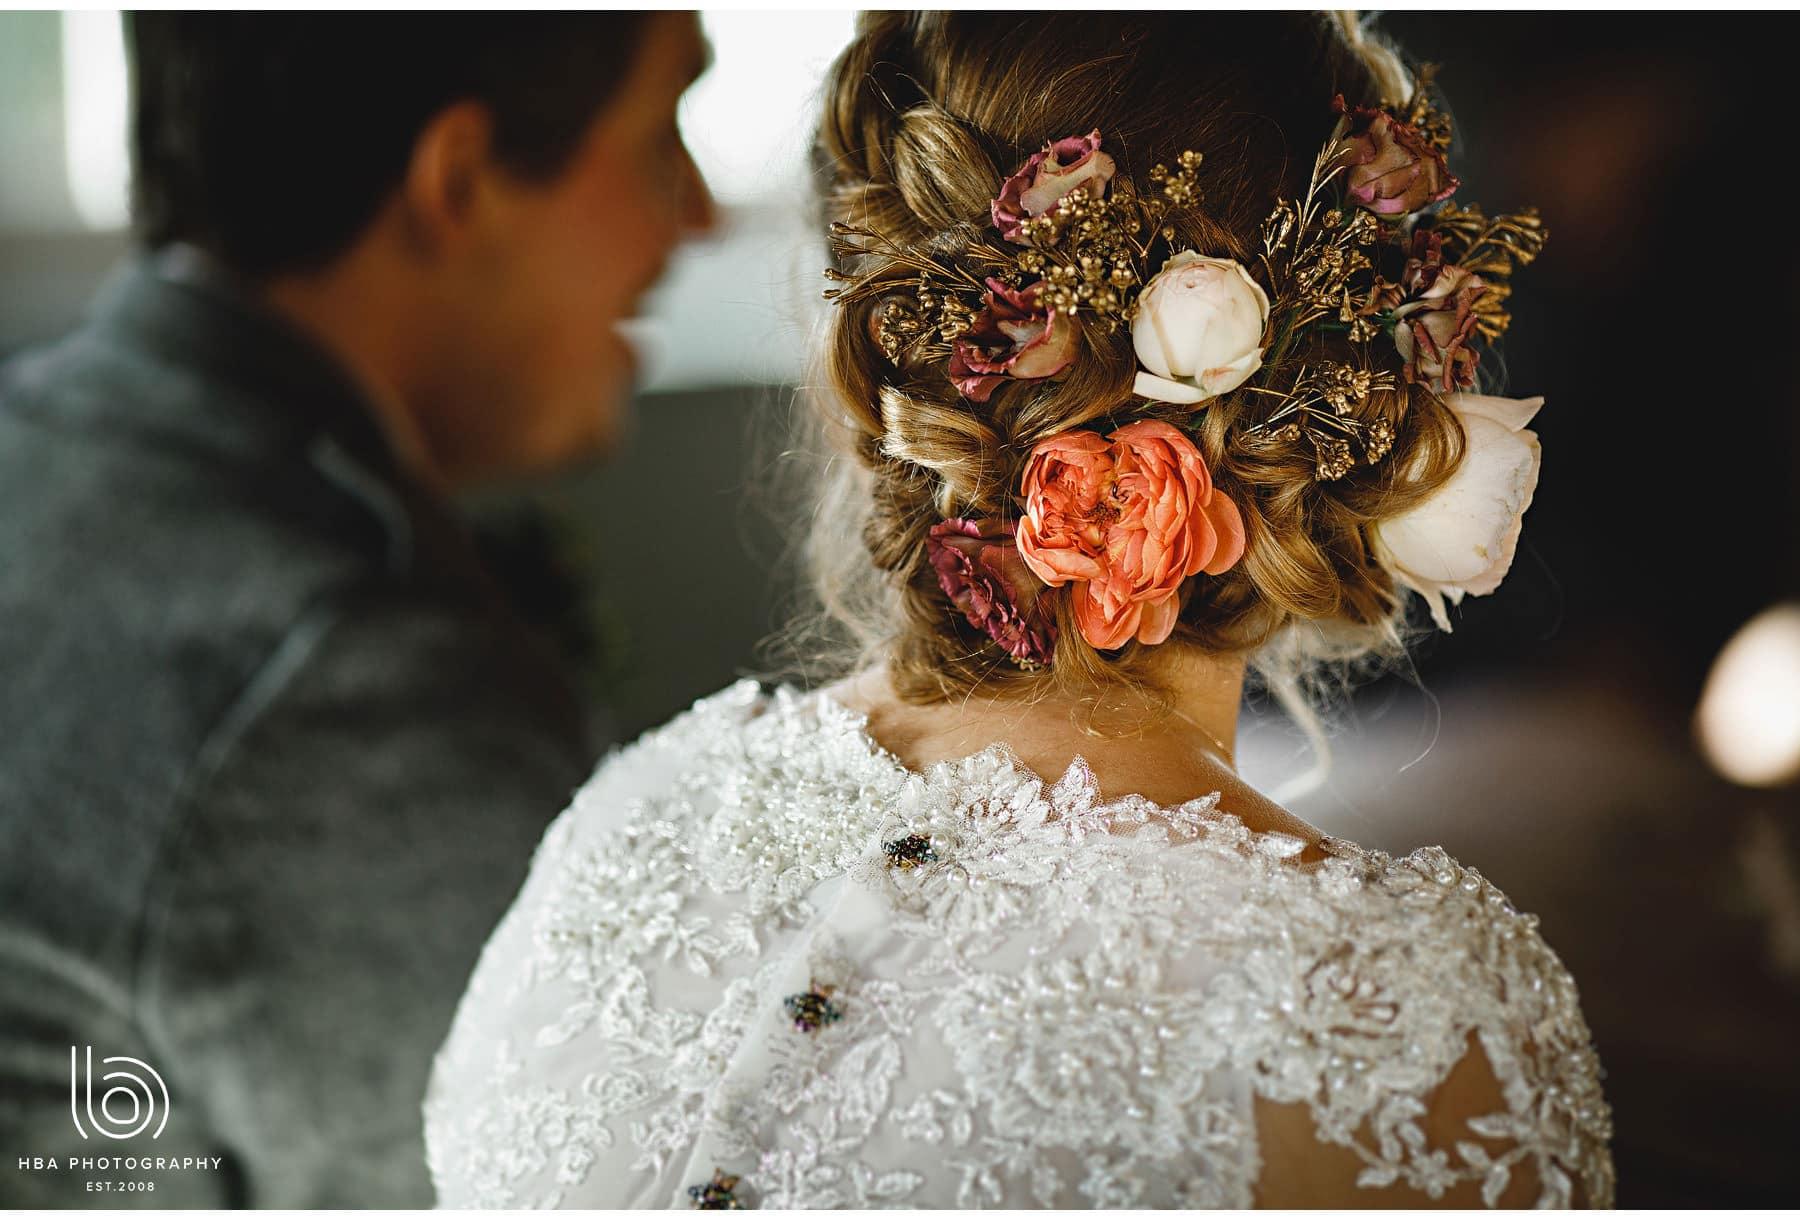 the bride's hair